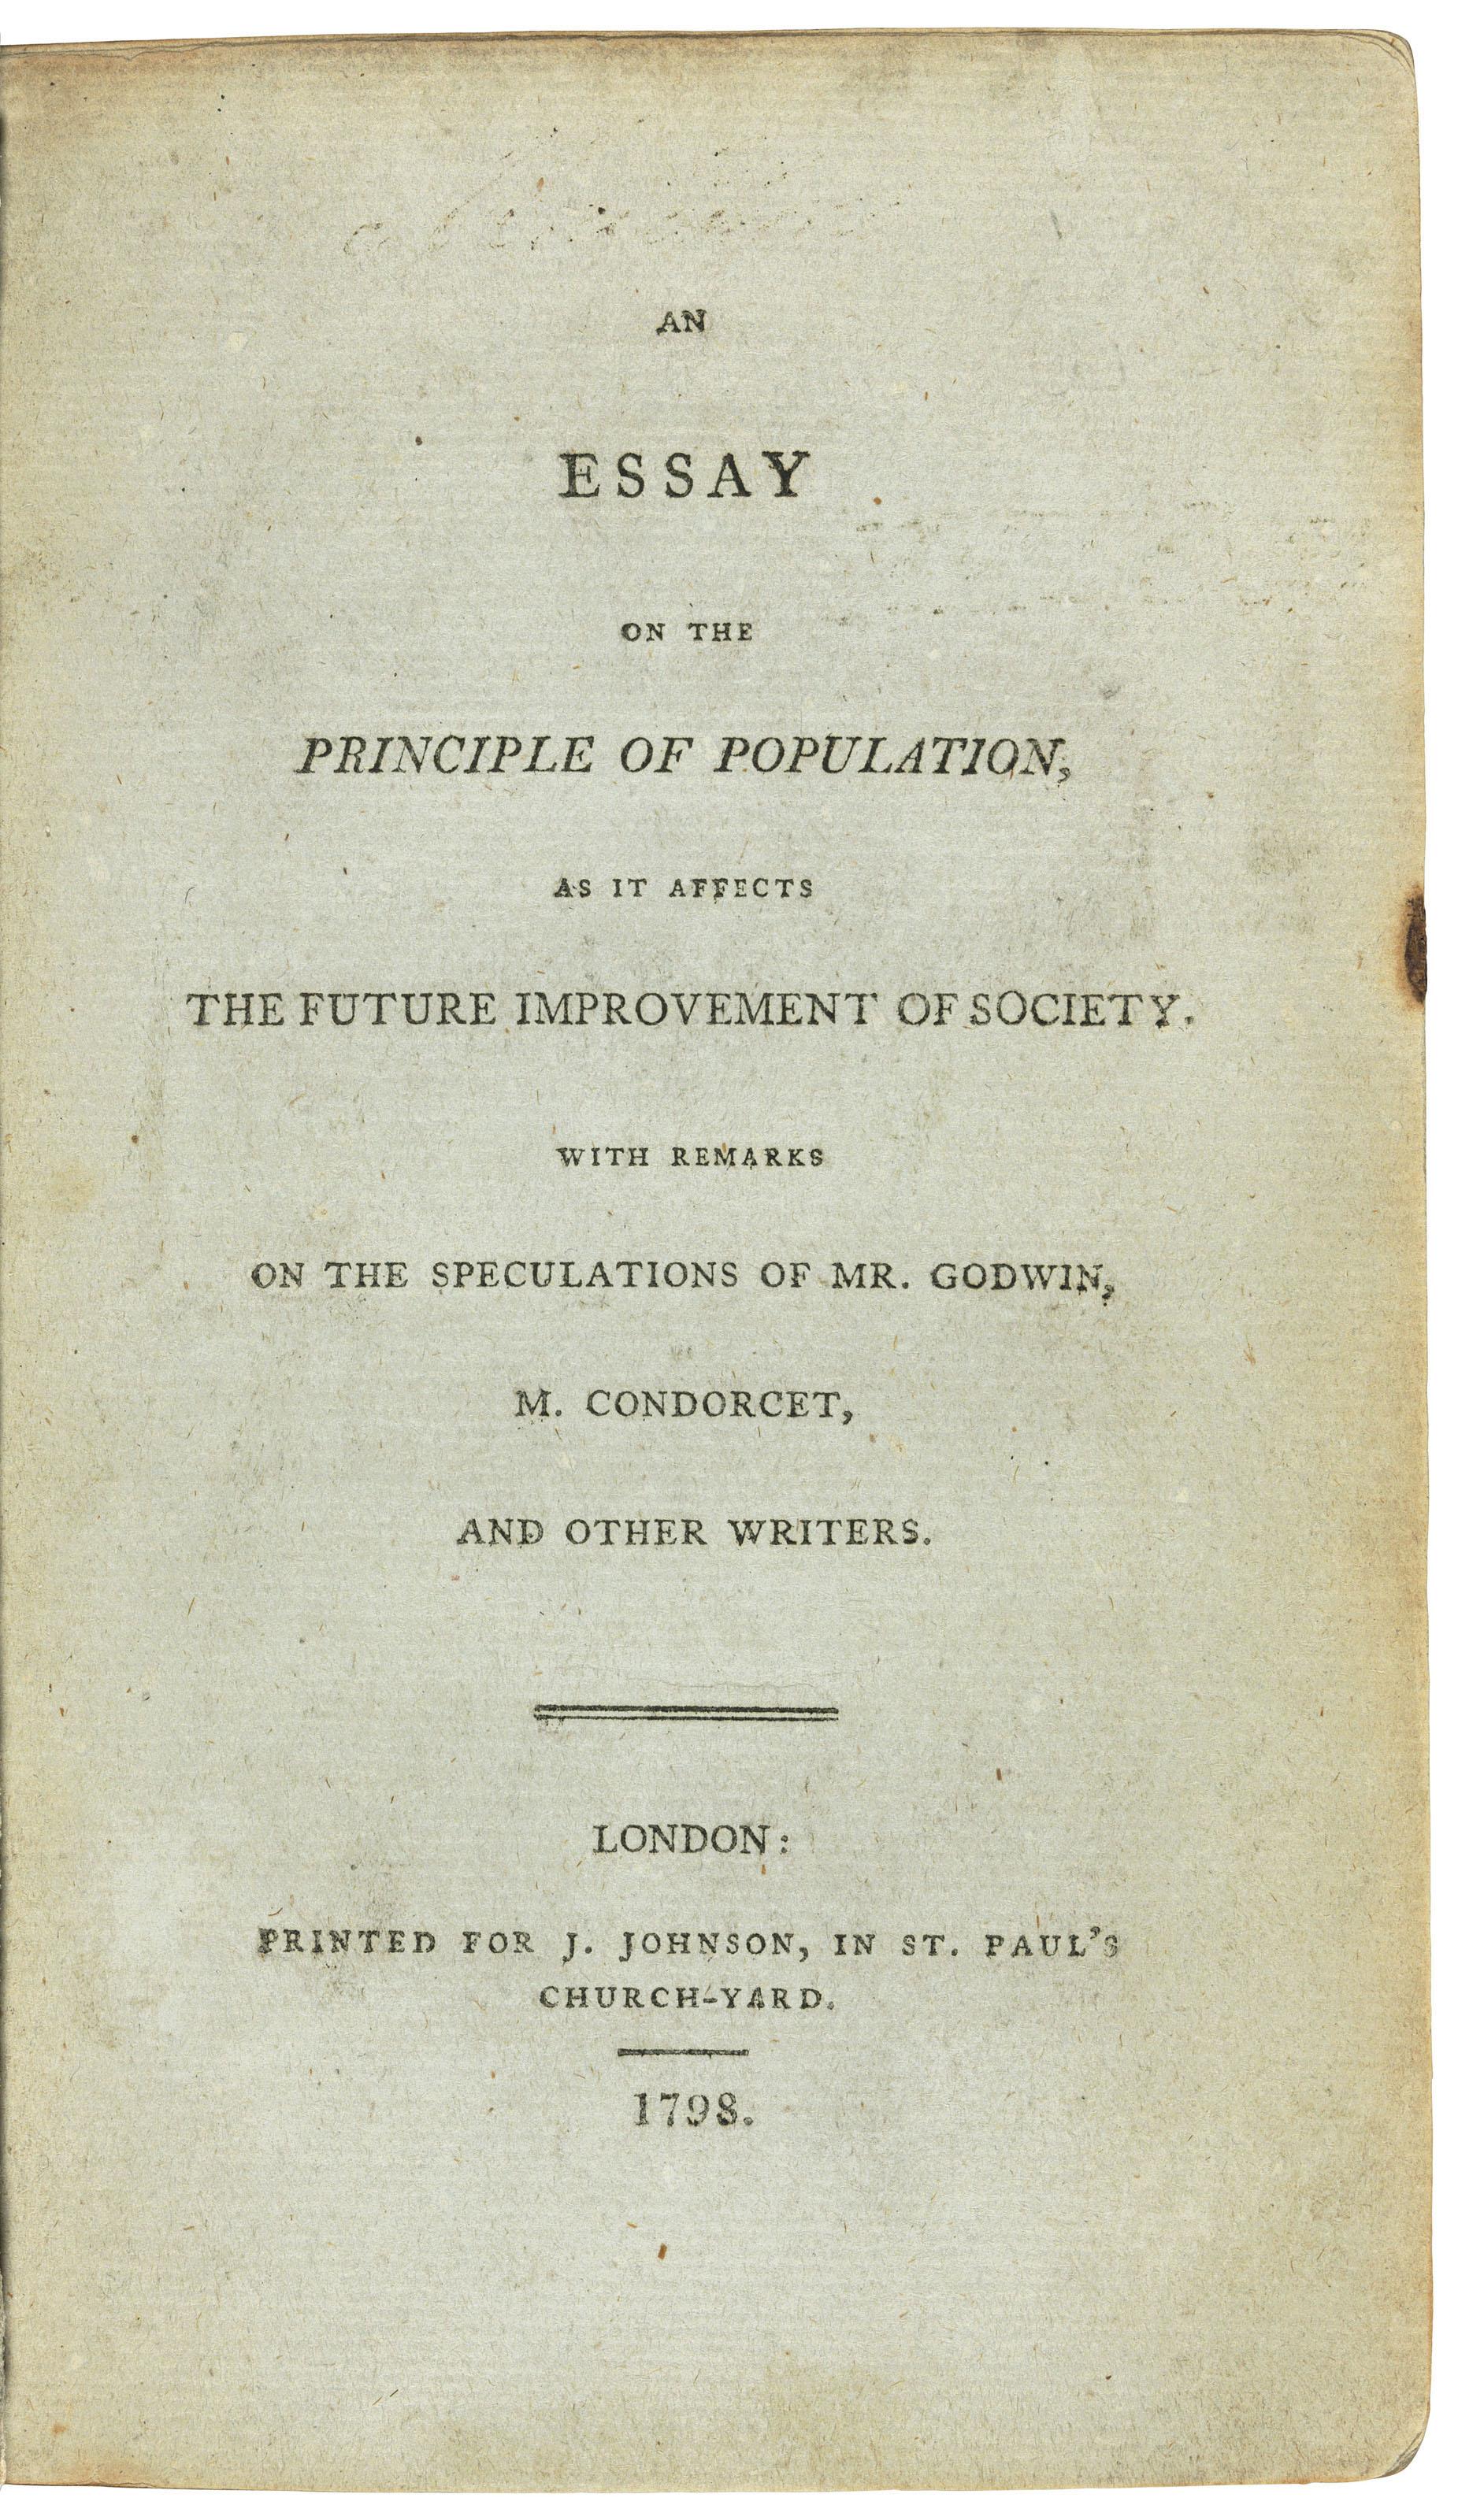 013 2018 Cks 16018 0261 000malthus Thomas Robert An Essay On The Principle Of As It Af Example Singular Population Pdf By Malthus Main Idea Full